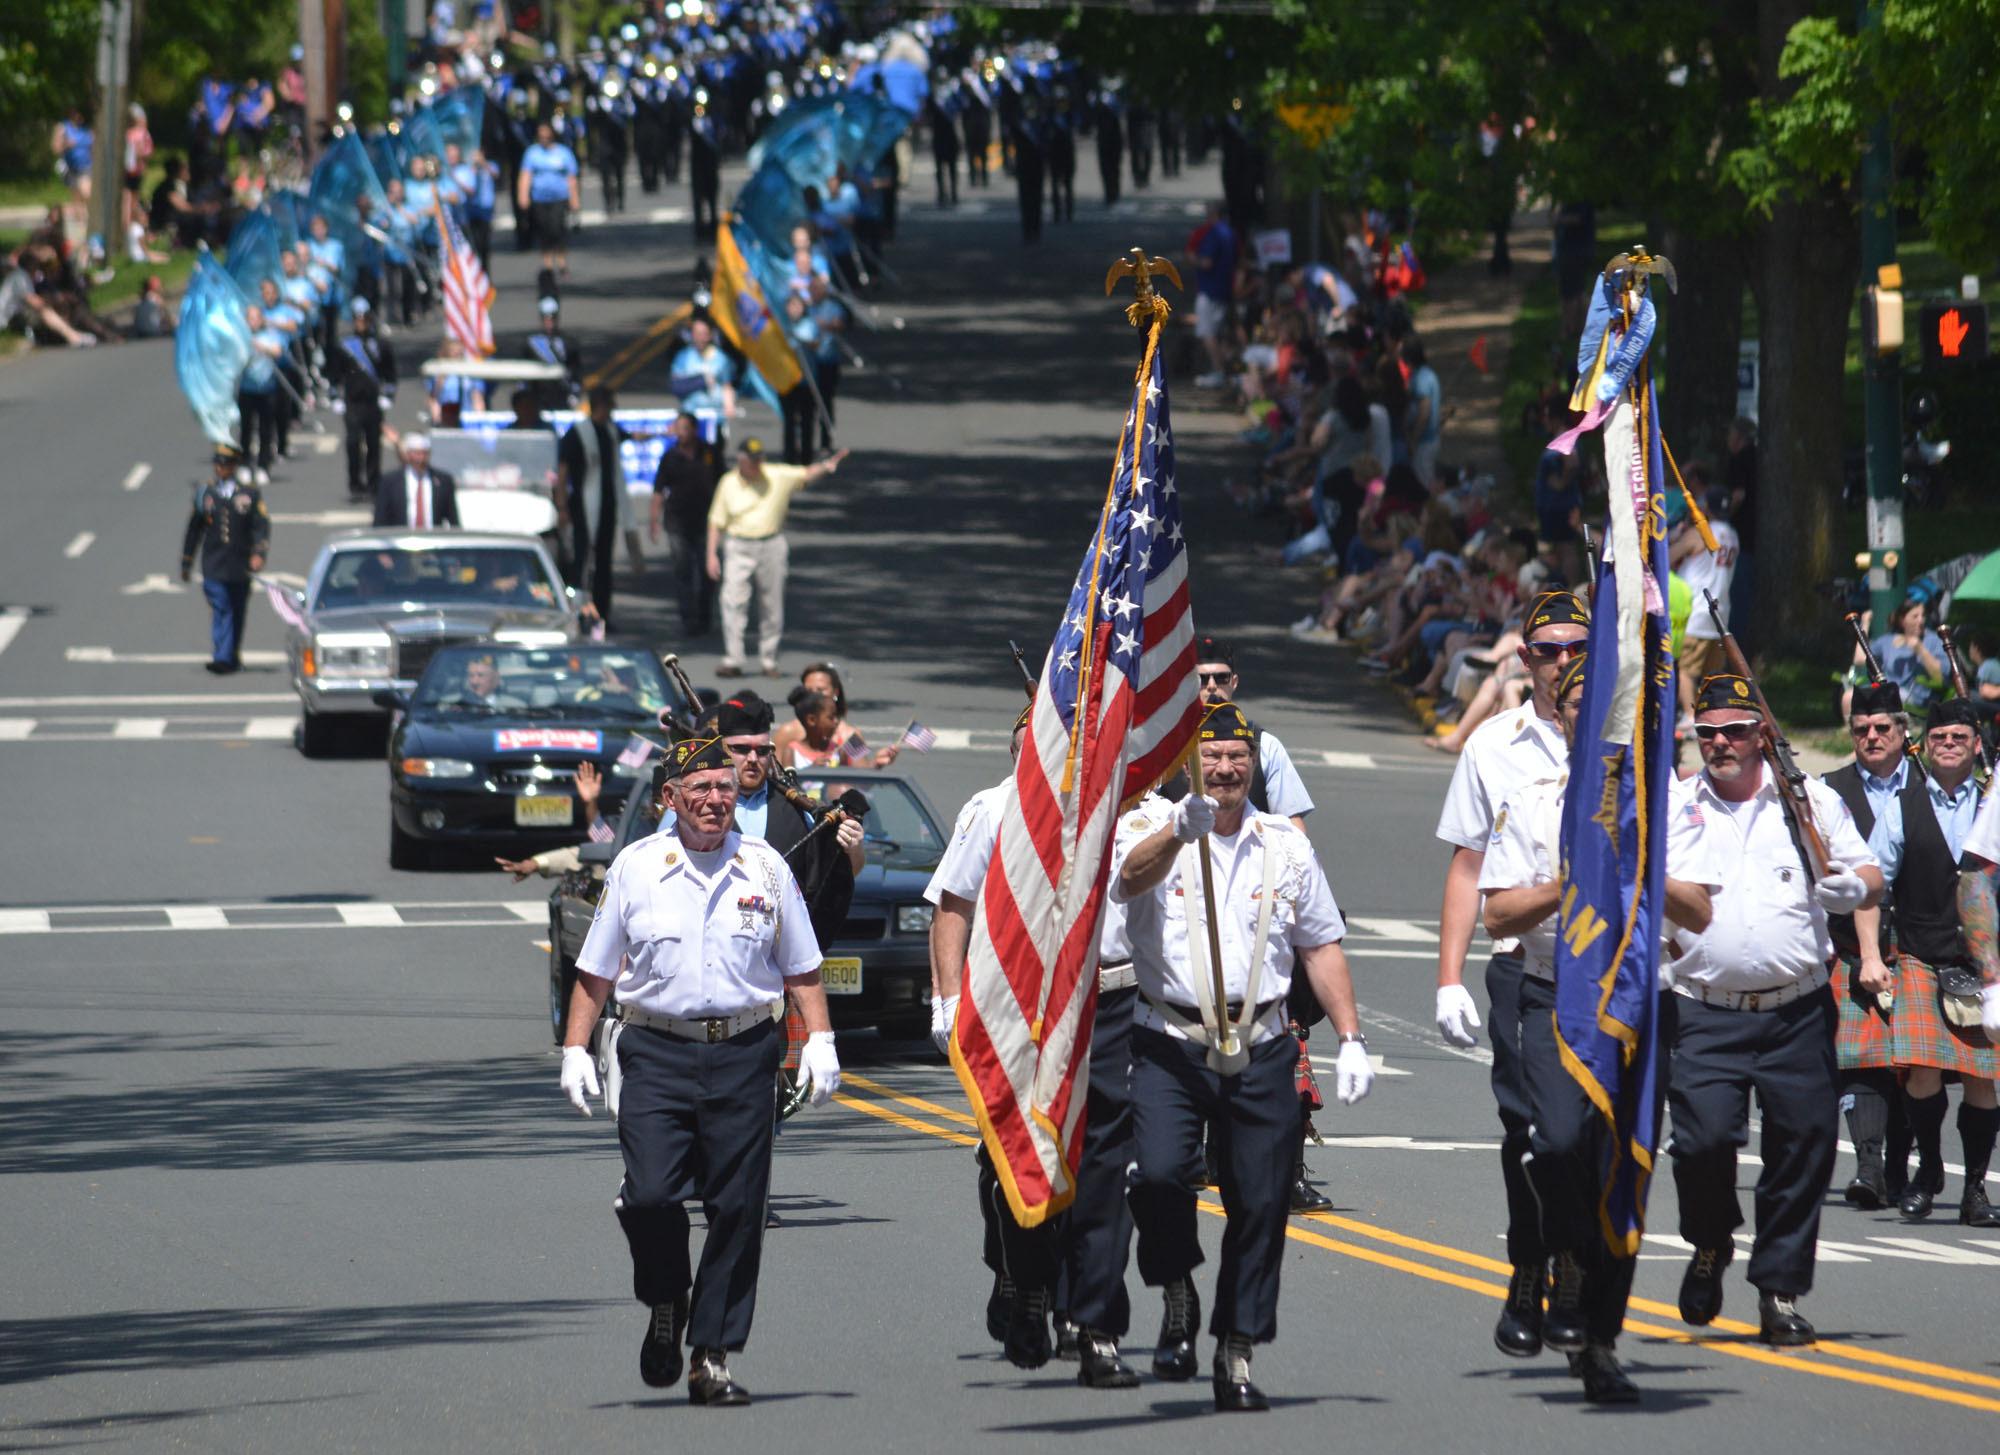 d9659163219e18f429fd_Memorial_Day_Parade_-_Horton_photo.jpg